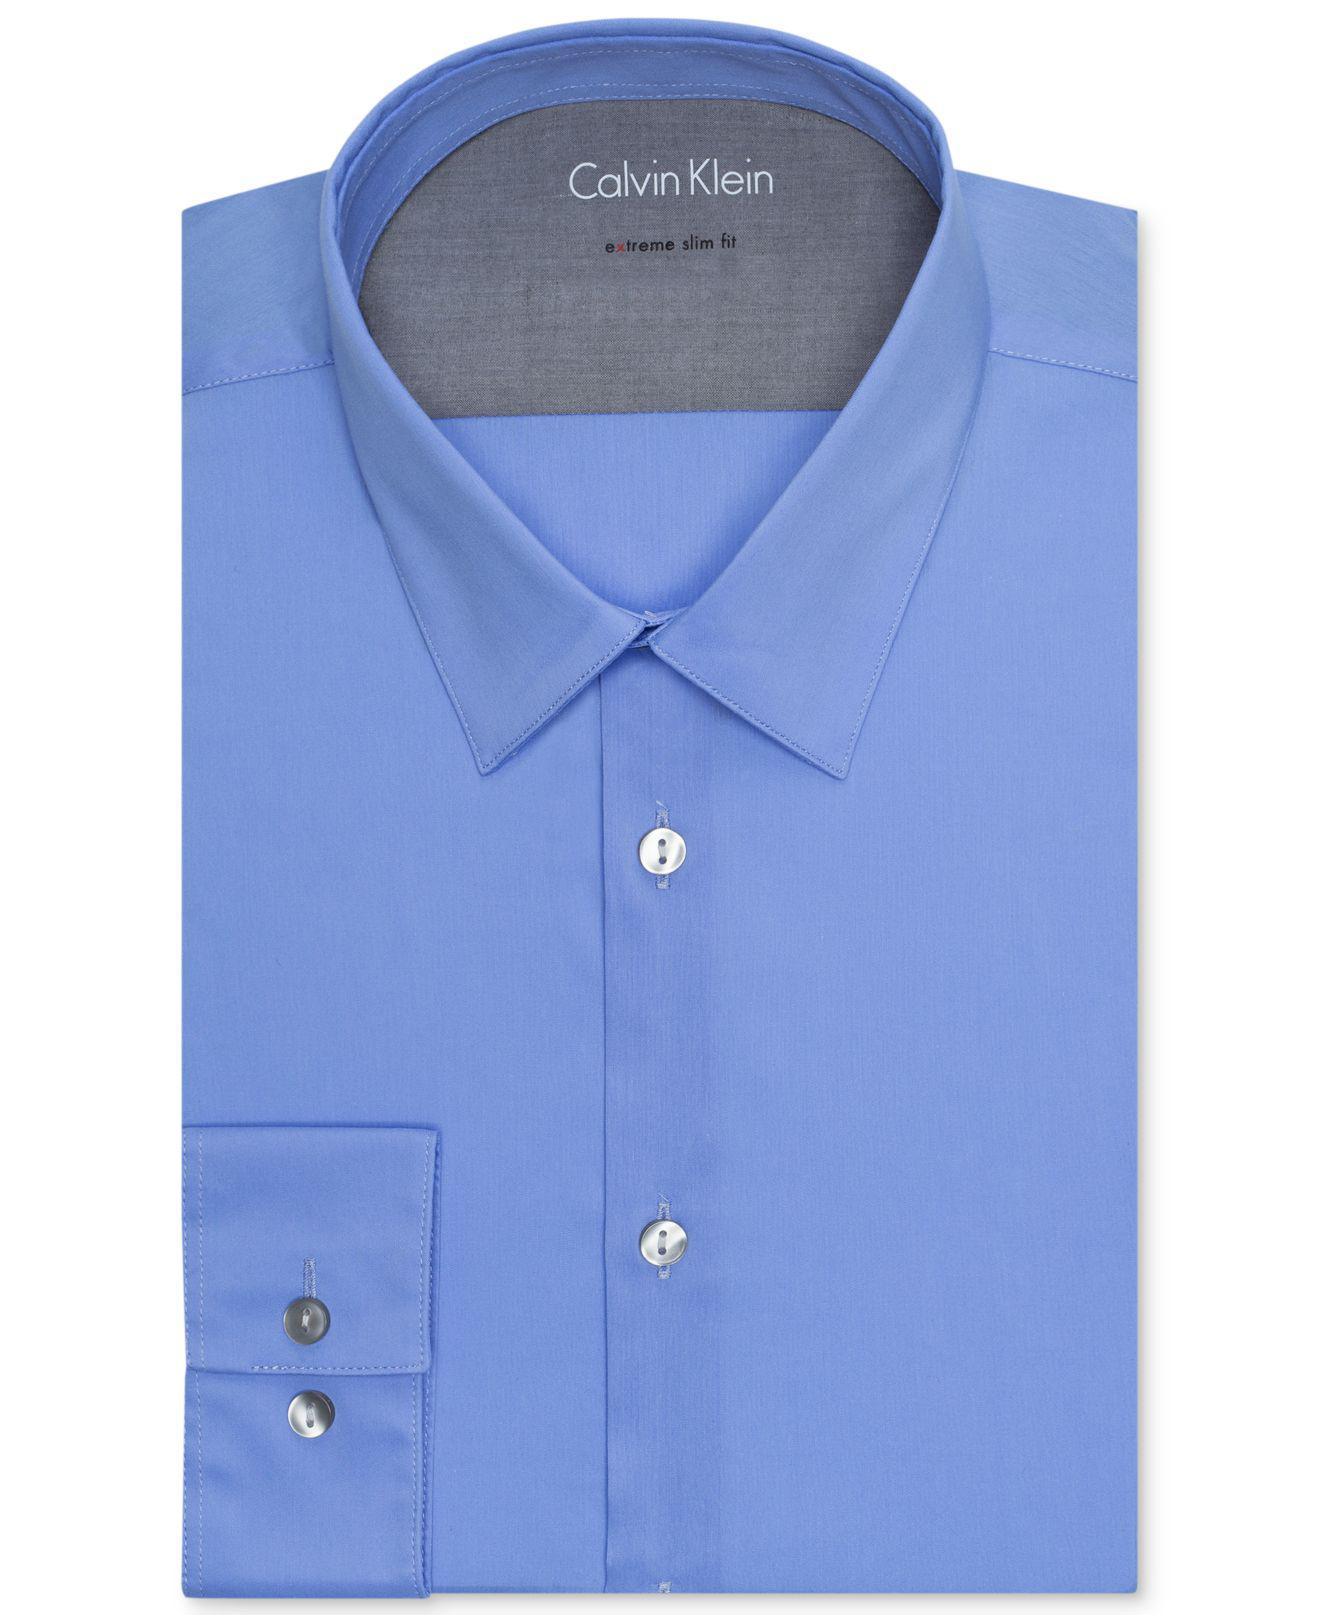 Lyst calvin klein men 39 s extra slim fit solid dress shirt for Calvin klein x fit dress shirt